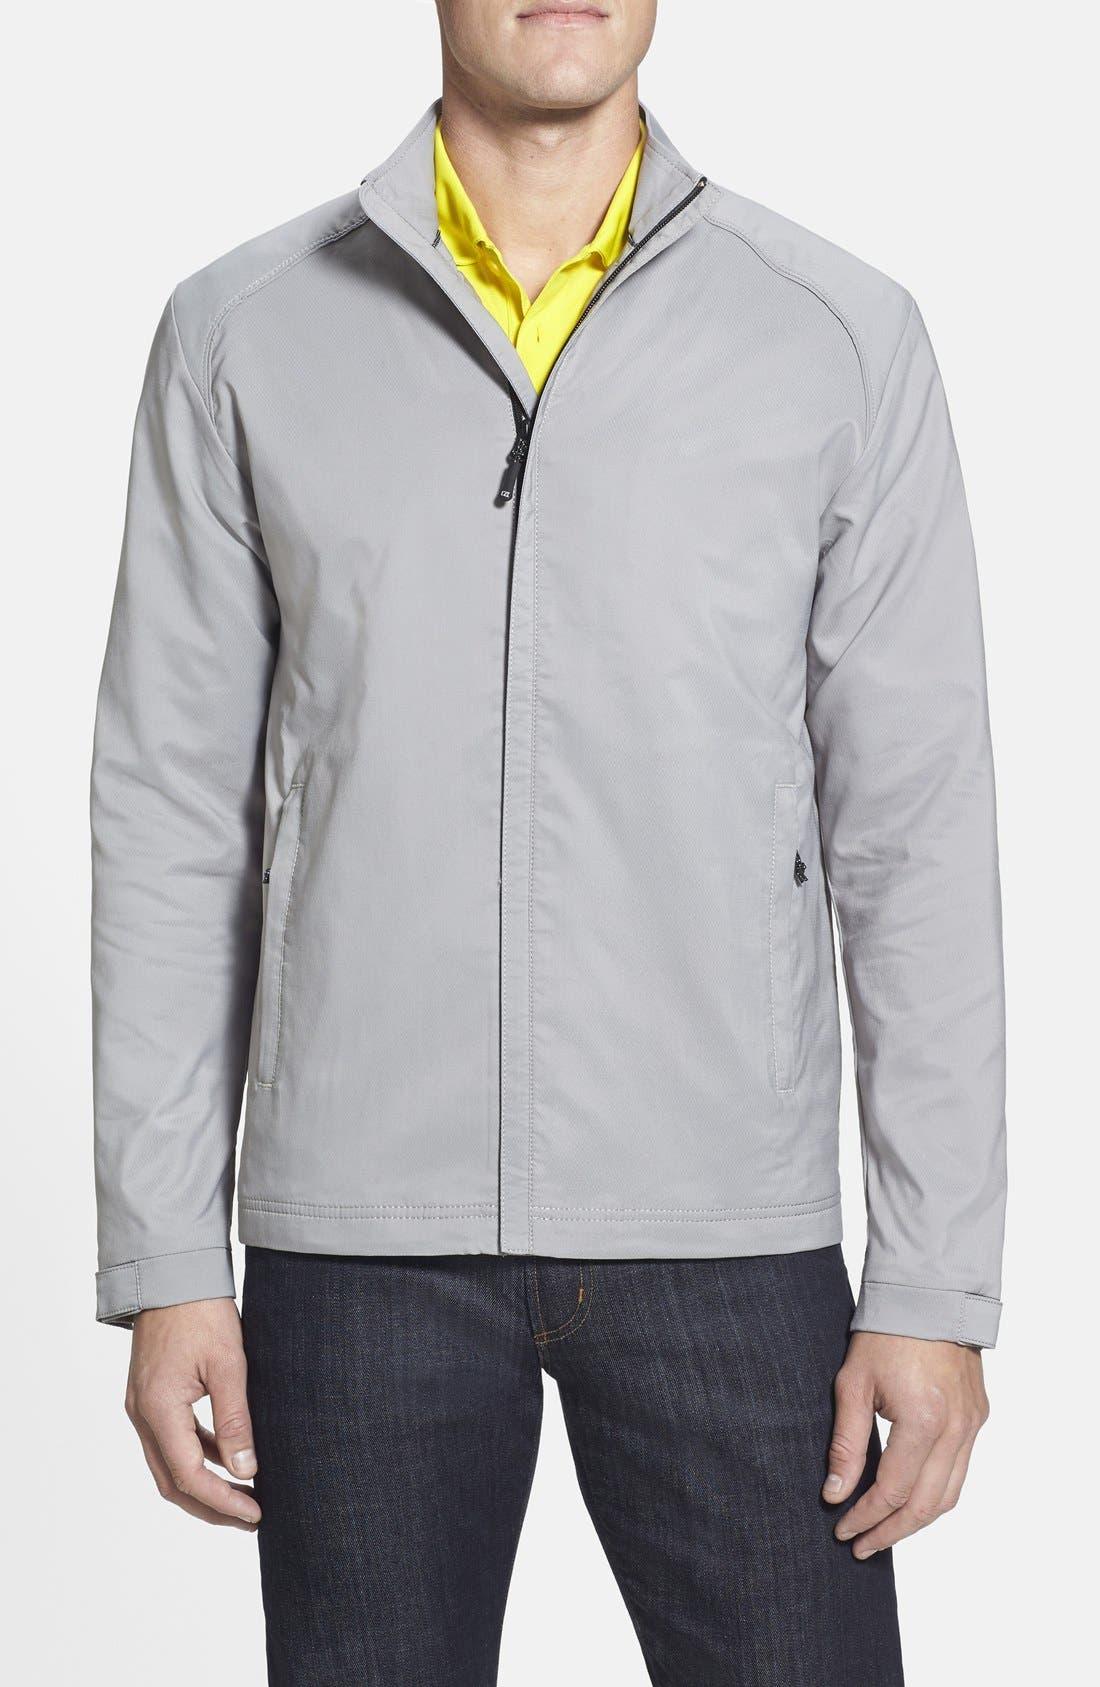 CUTTER & BUCK Blakely WeatherTec<sup>®</sup> Wind & Water Resistant Full Zip Jacket, Main, color, OXIDE GREY